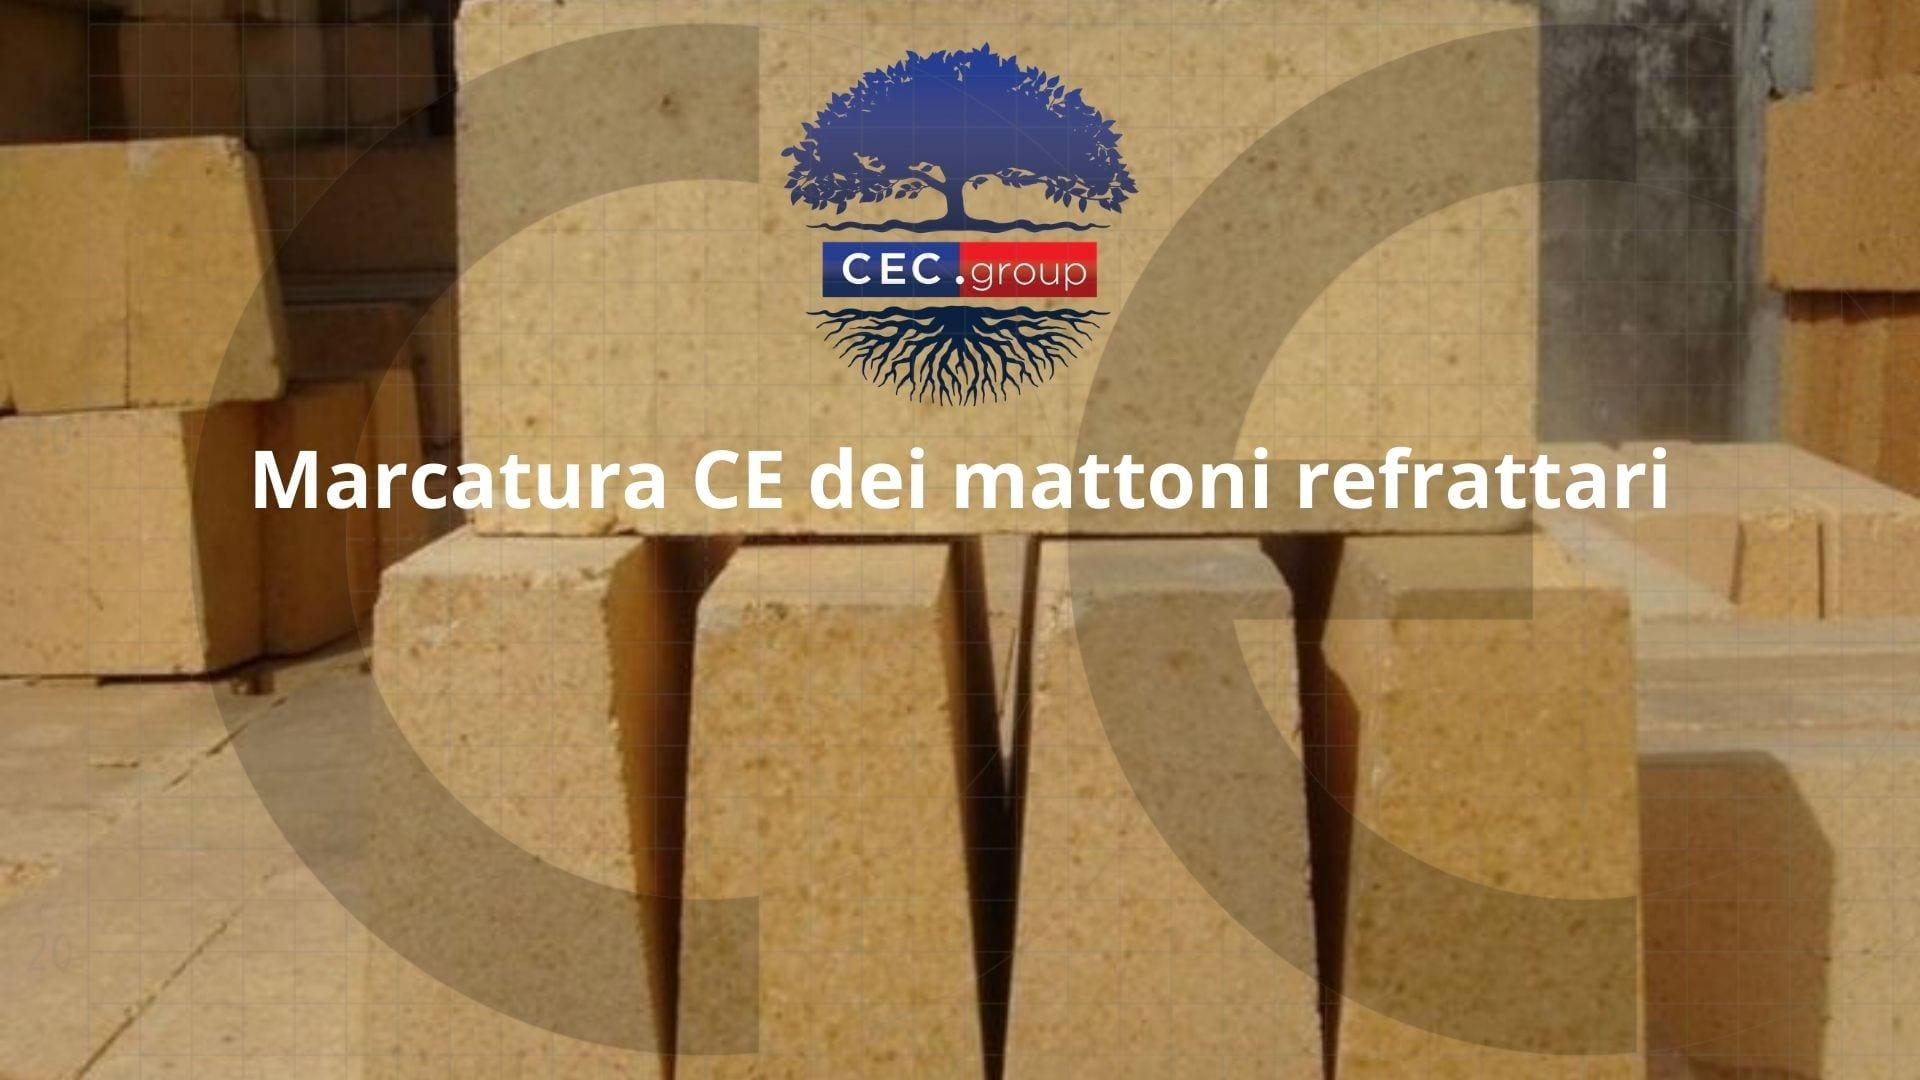 Marcatura CE mattoni refrattari